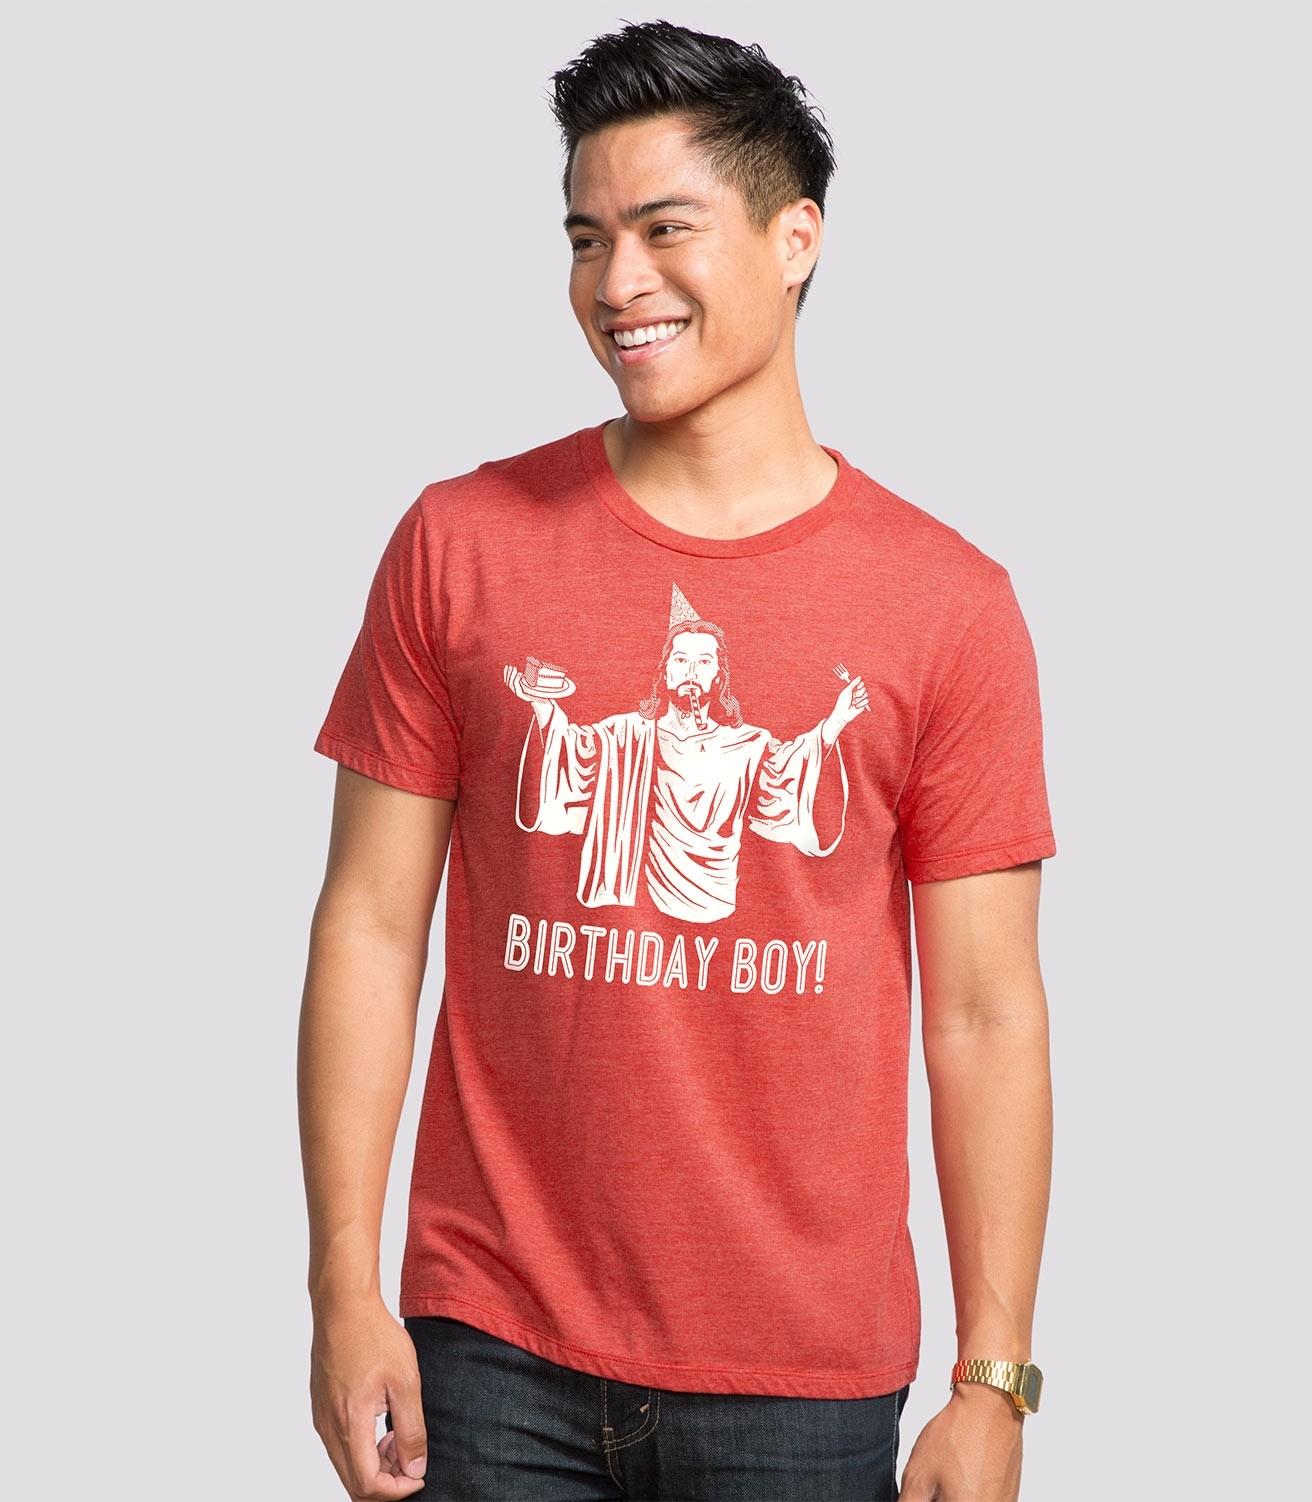 5467c9ccf Birthday Boy Men's T-Shirt | Headline Shirts